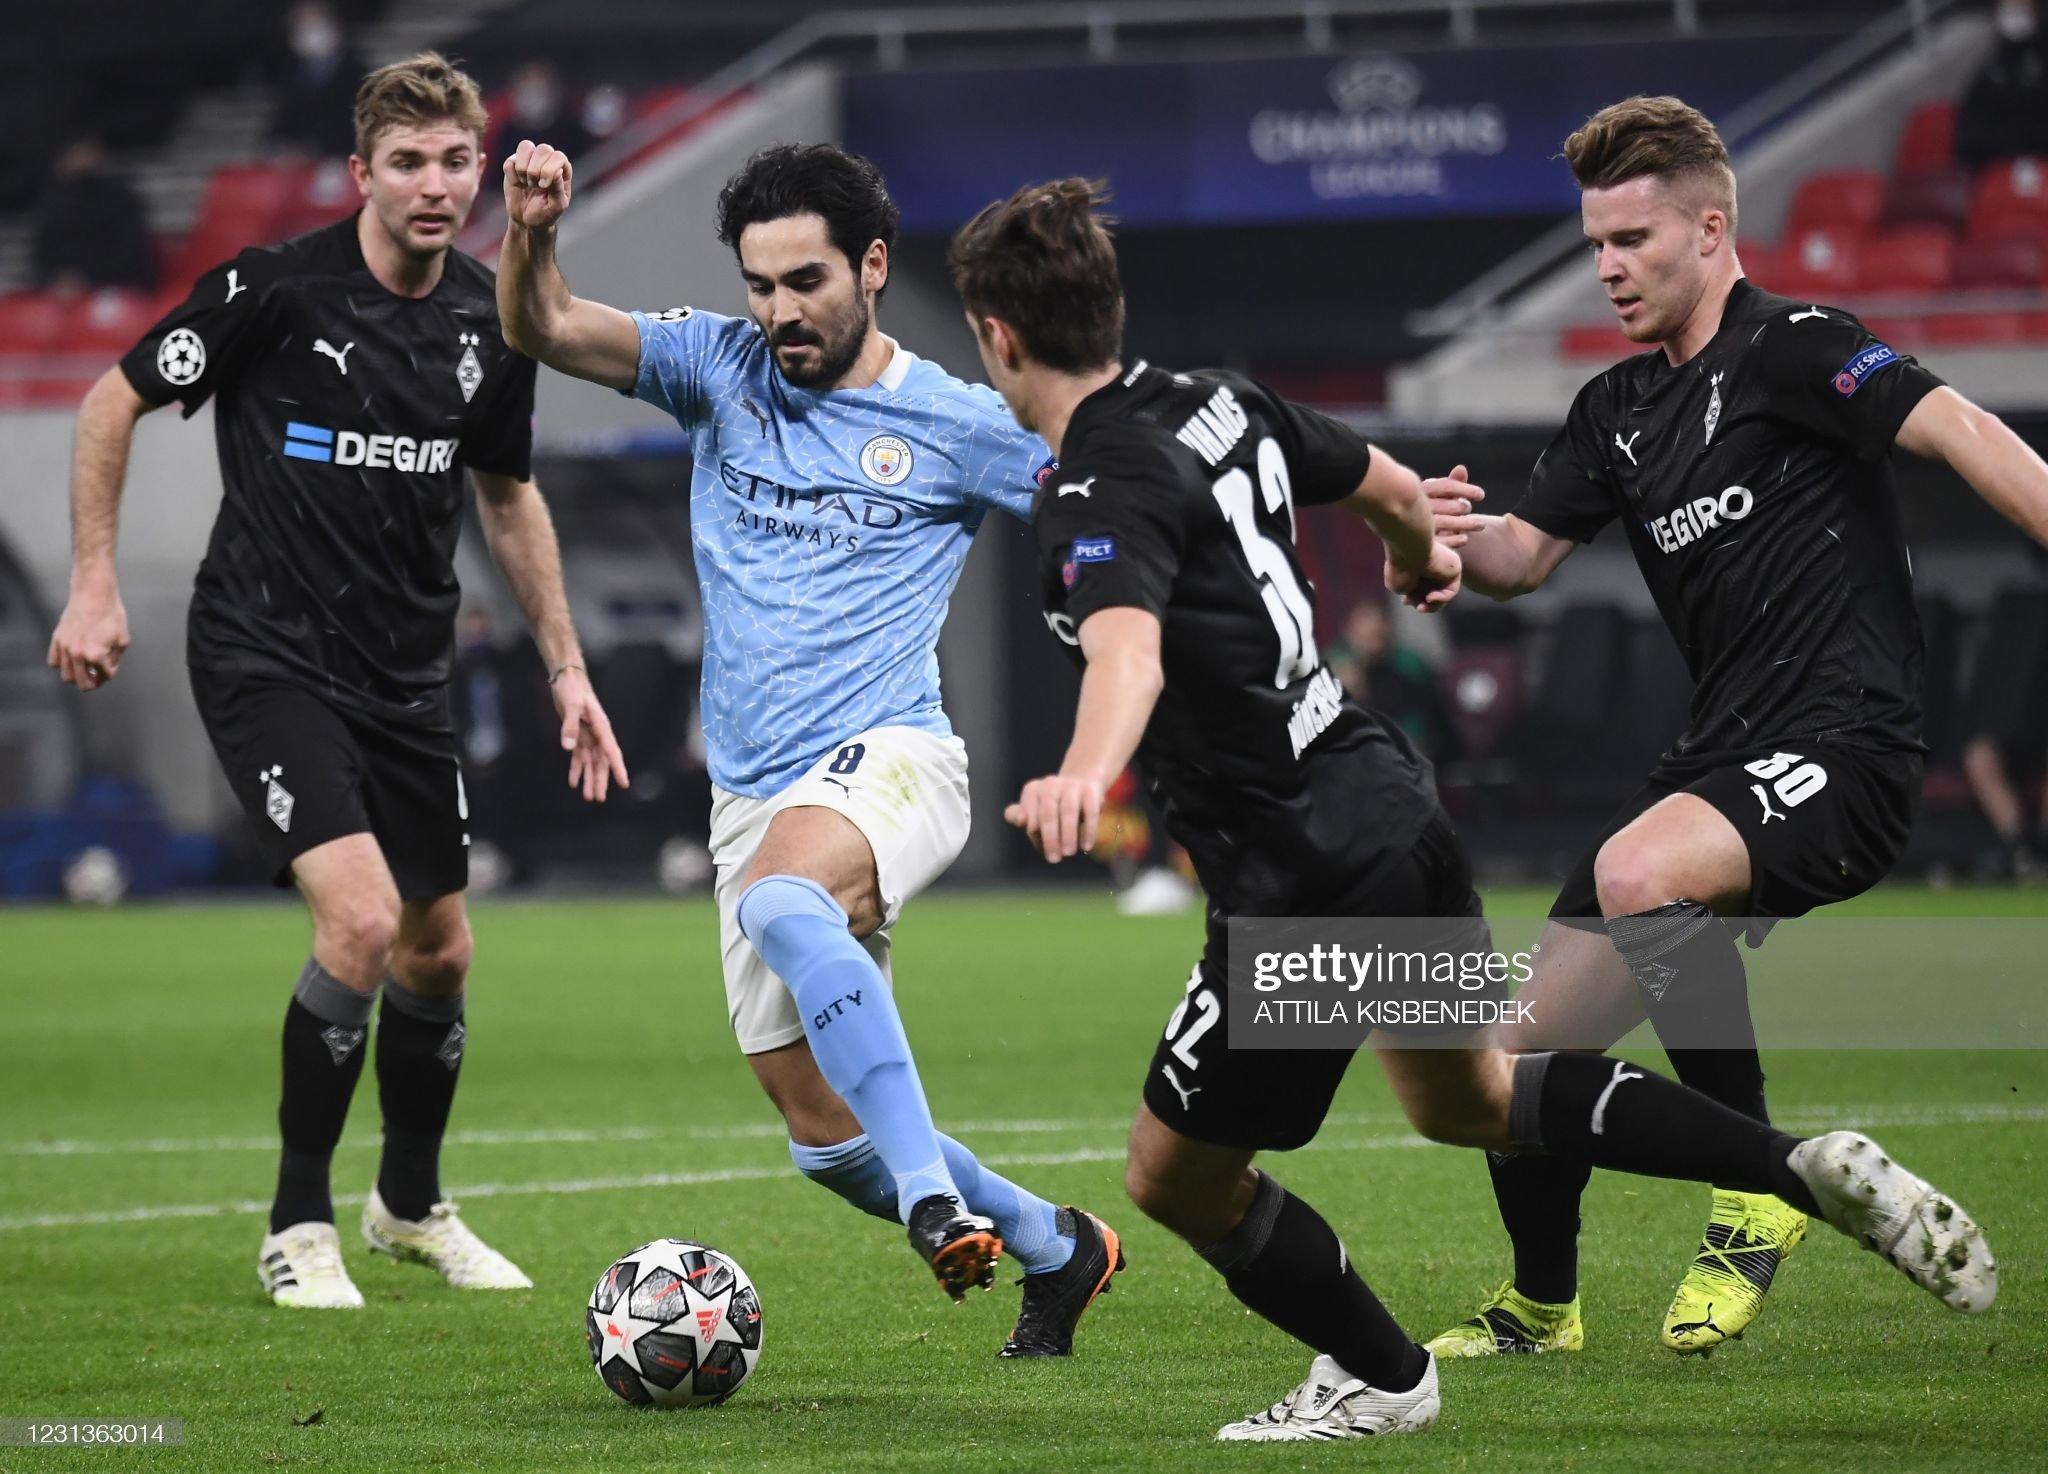 Manchester City vs Borussia Monchengladbach preview, prediction and odds